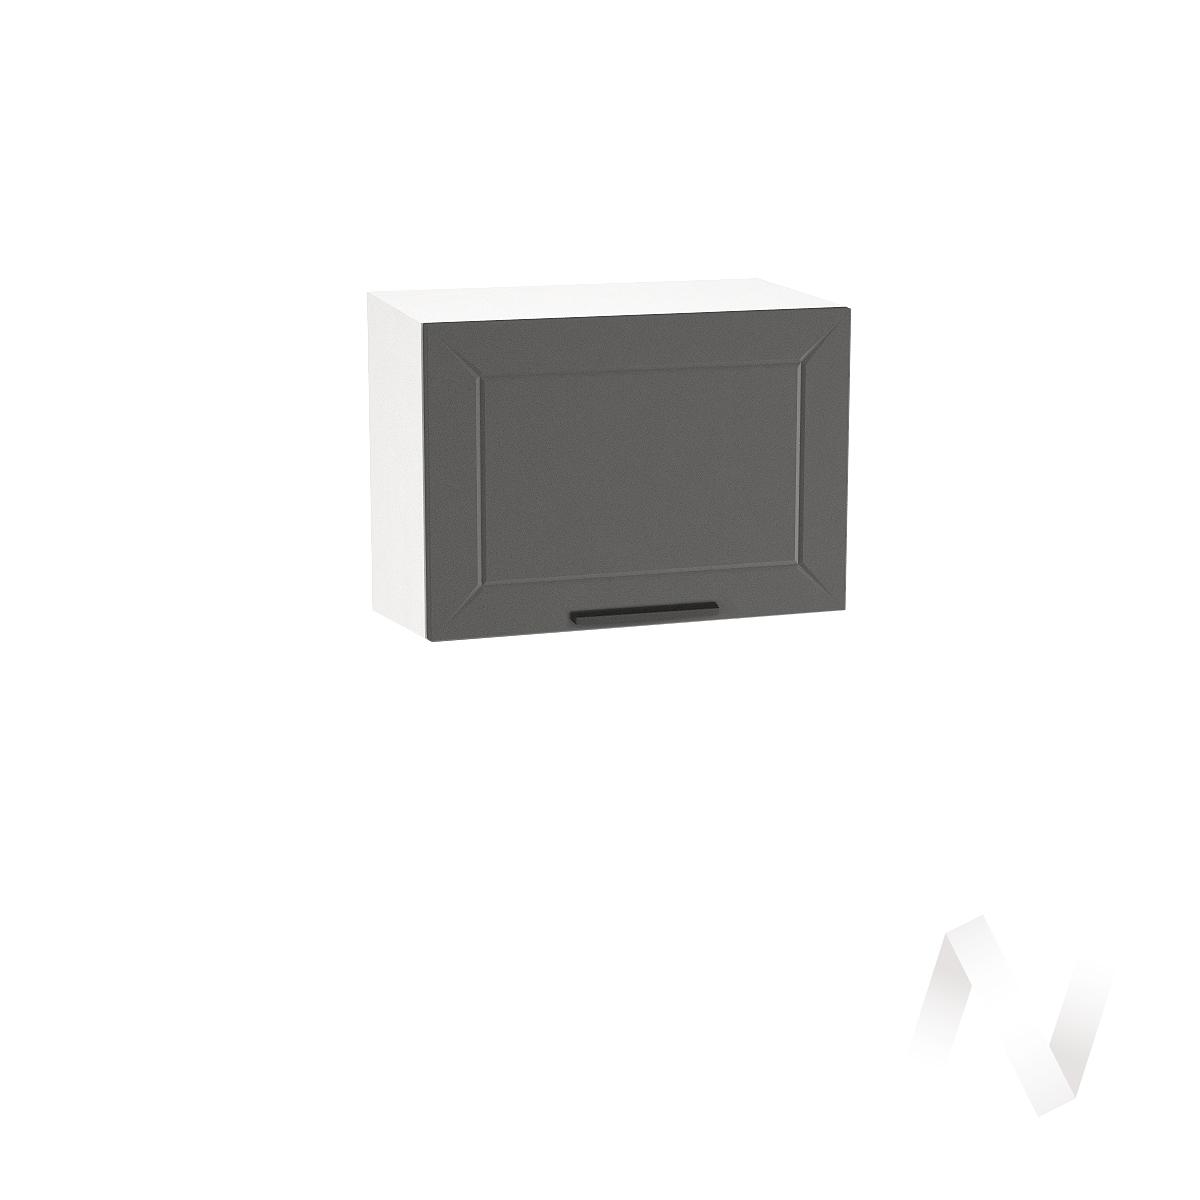 "Кухня ""Глетчер"": Шкаф верхний горизонтальный 509, ШВГ 509 (Маренго силк/корпус белый)"